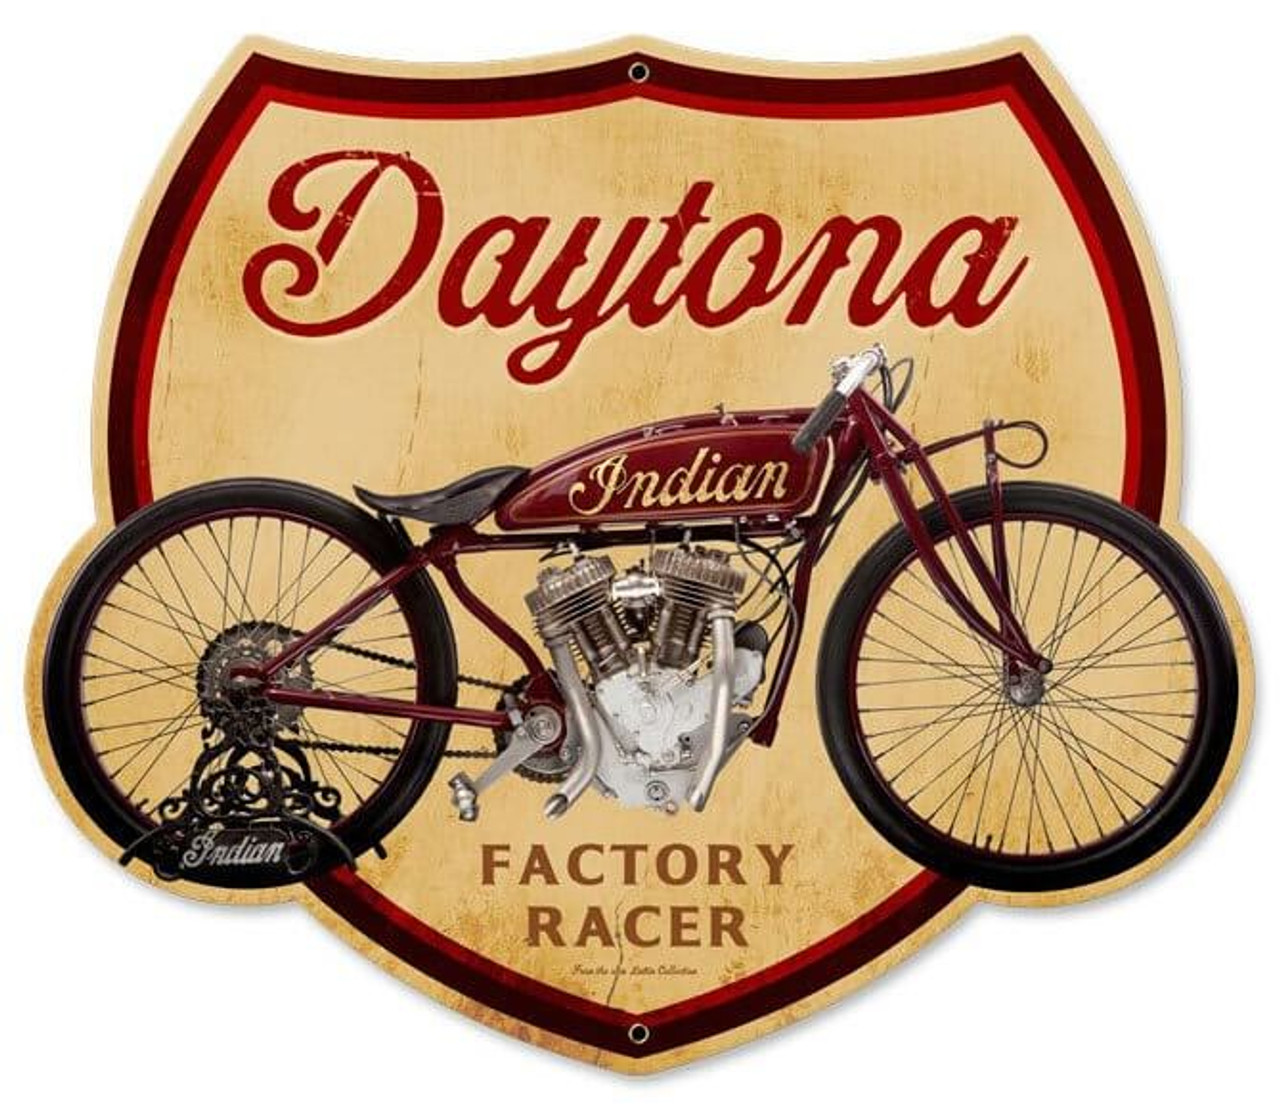 Retro Daytona Metal Sign 17 x 14 Inches